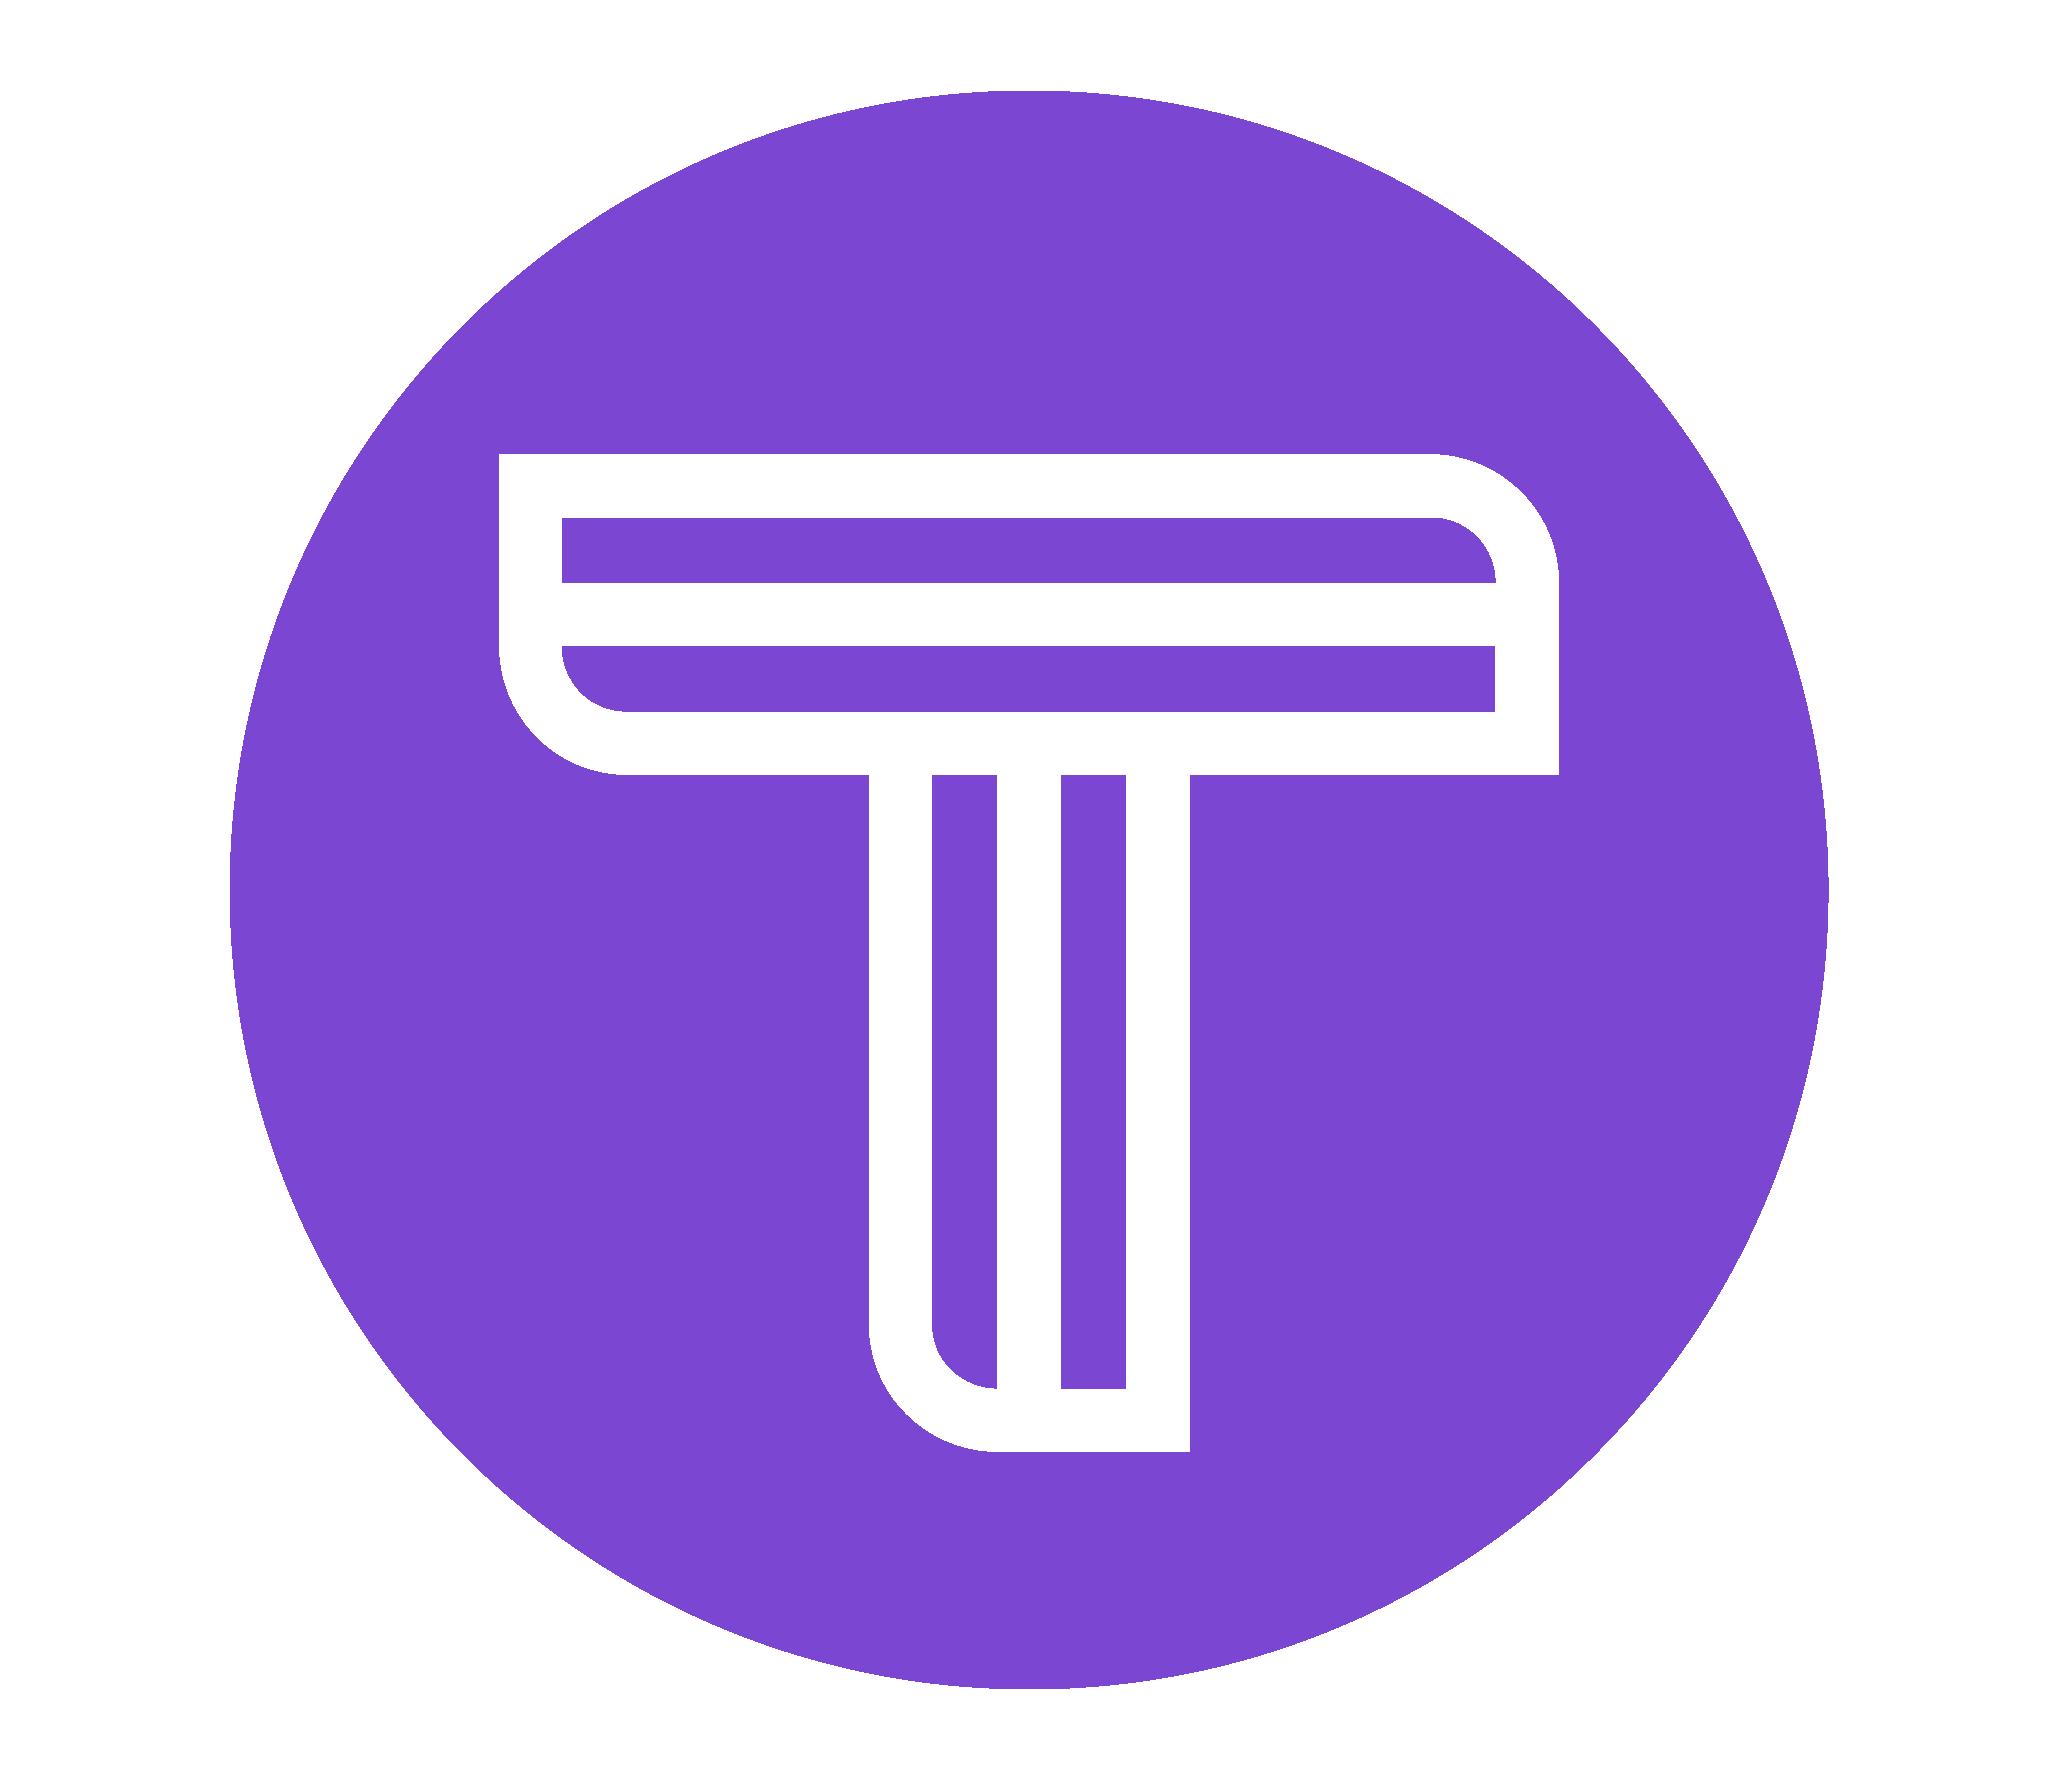 Logomark PNG -